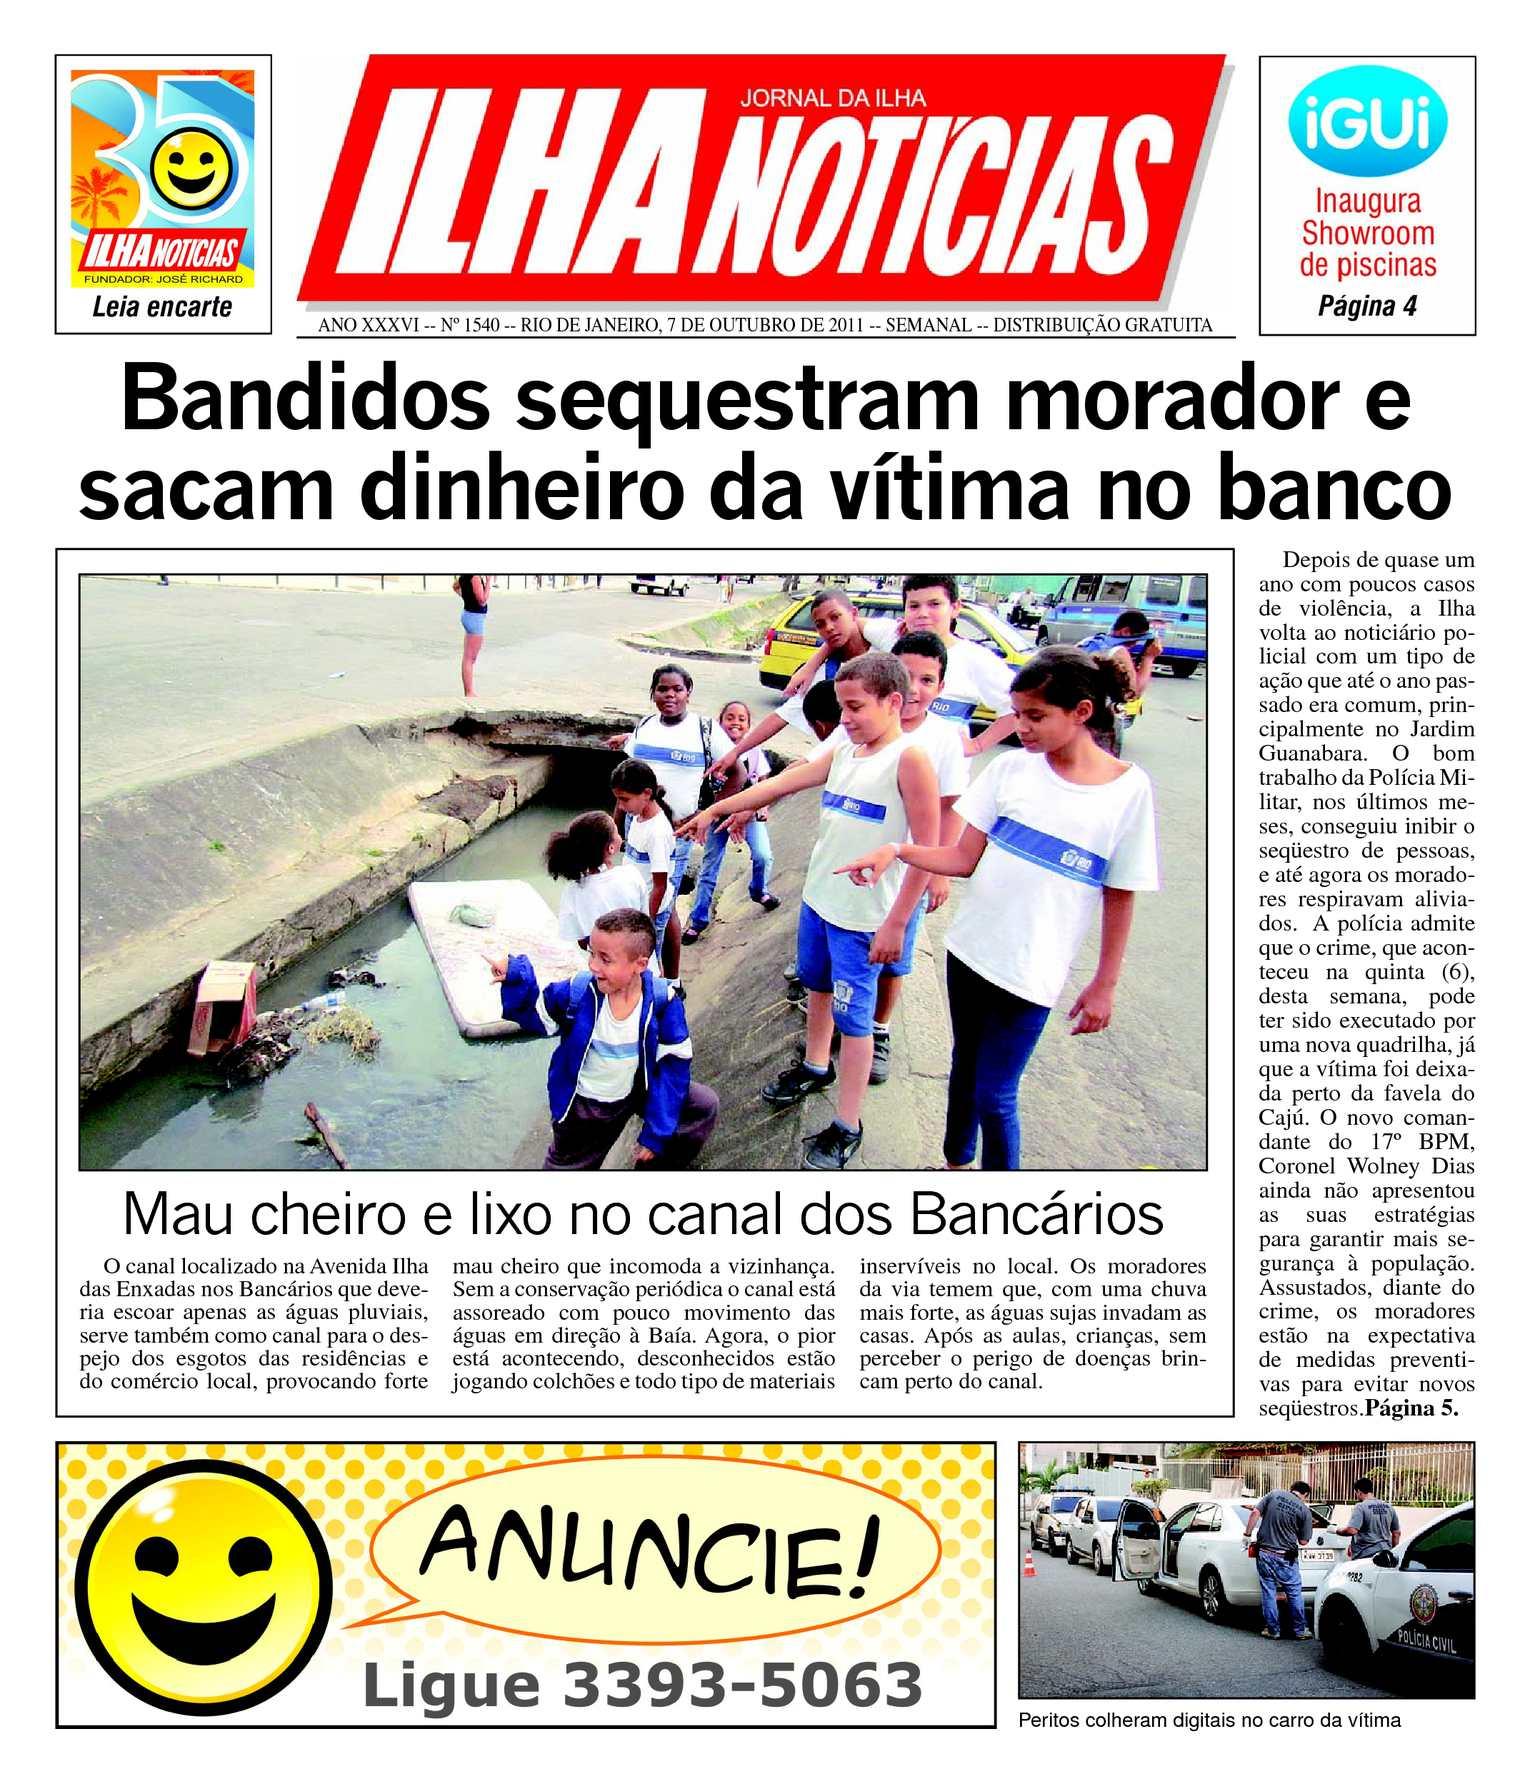 514f1eb320c Calaméo - Jornal Ilha Notícias - Edição 1540 - 07 10 2011